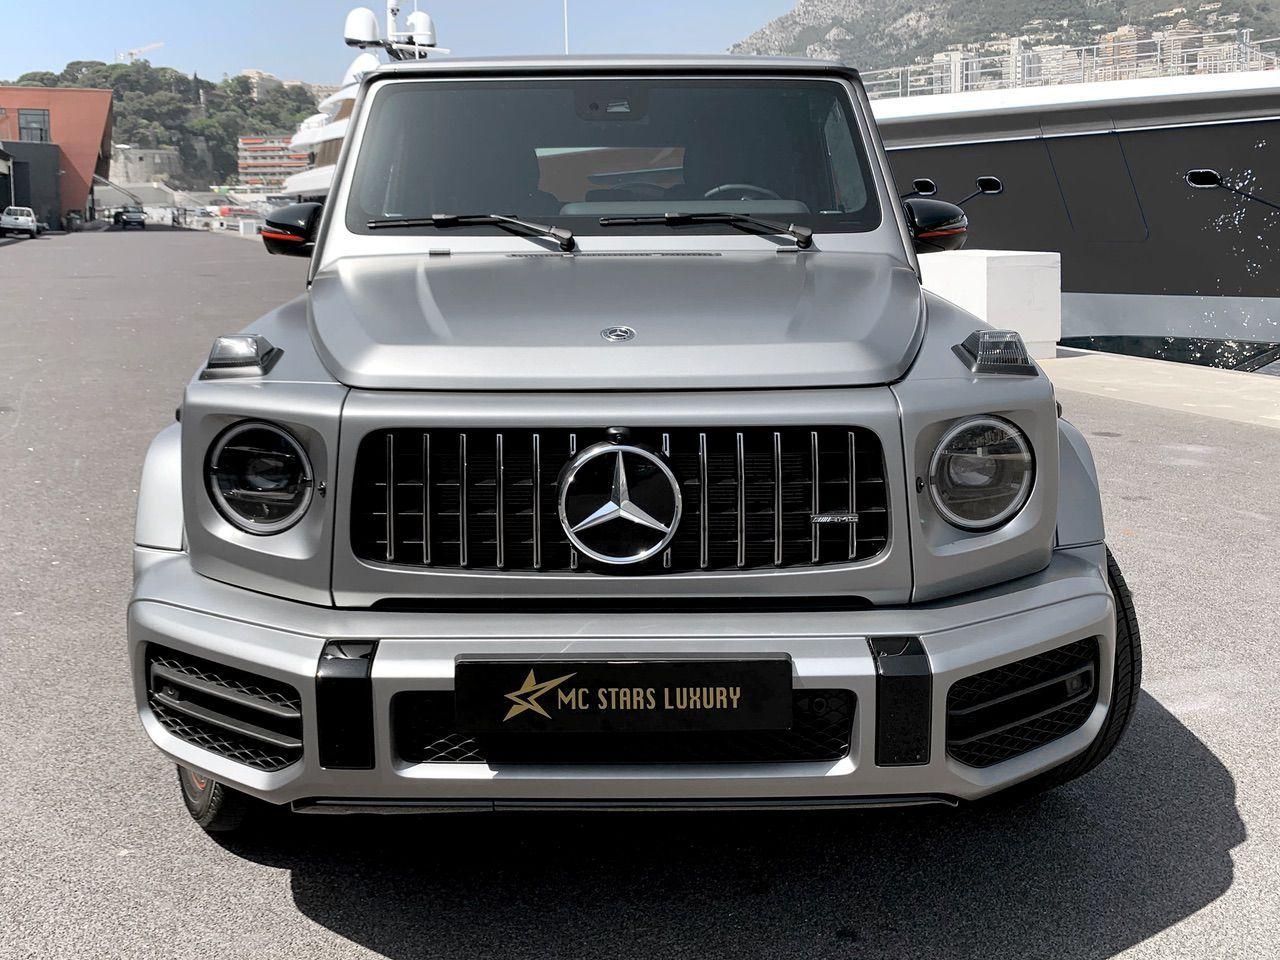 Mercedes-Benz G 63 AMG Edition 1 - FOR SALE  #mercedes #mercedesbenz #amg #edition1 #mercedeslovers #mercedes63amg #cars #amgaddict #mercedeslife #mercedesclub #forsale #supercars #starsmontecarlo #tradinglux